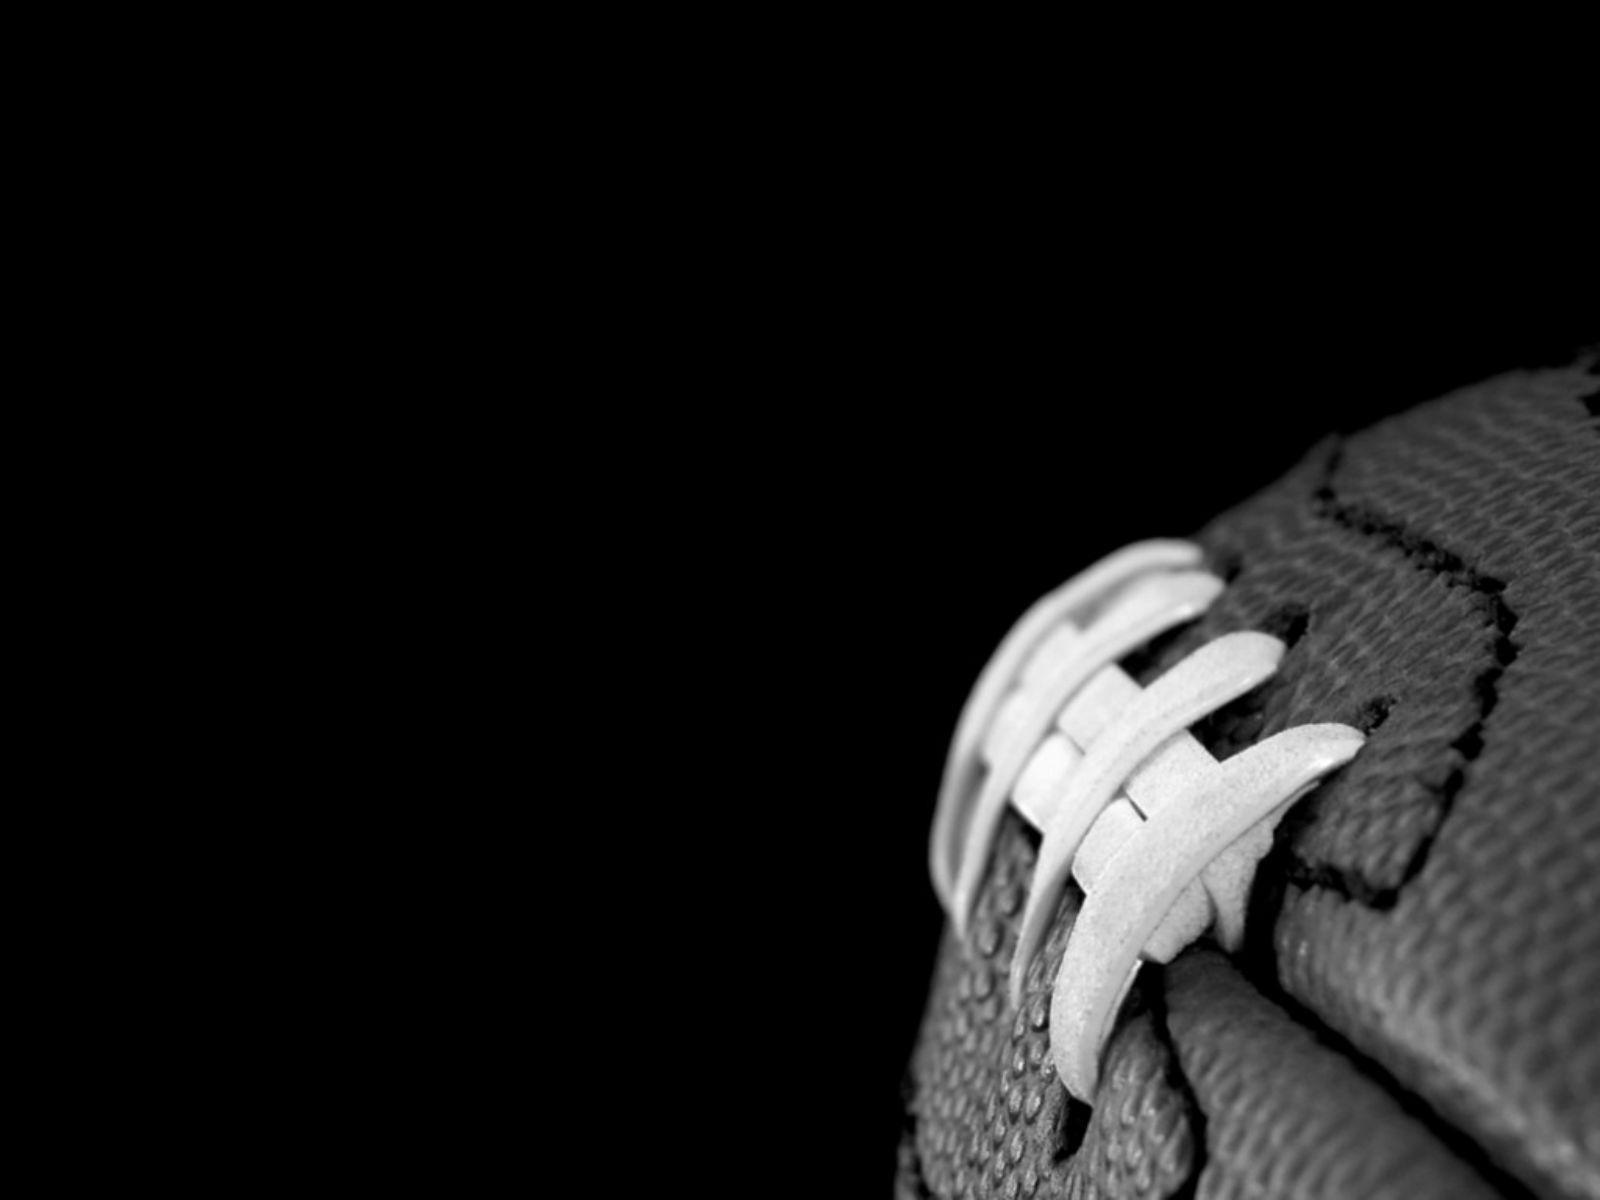 American Football Backgrounds Desktop: Football Backgrounds